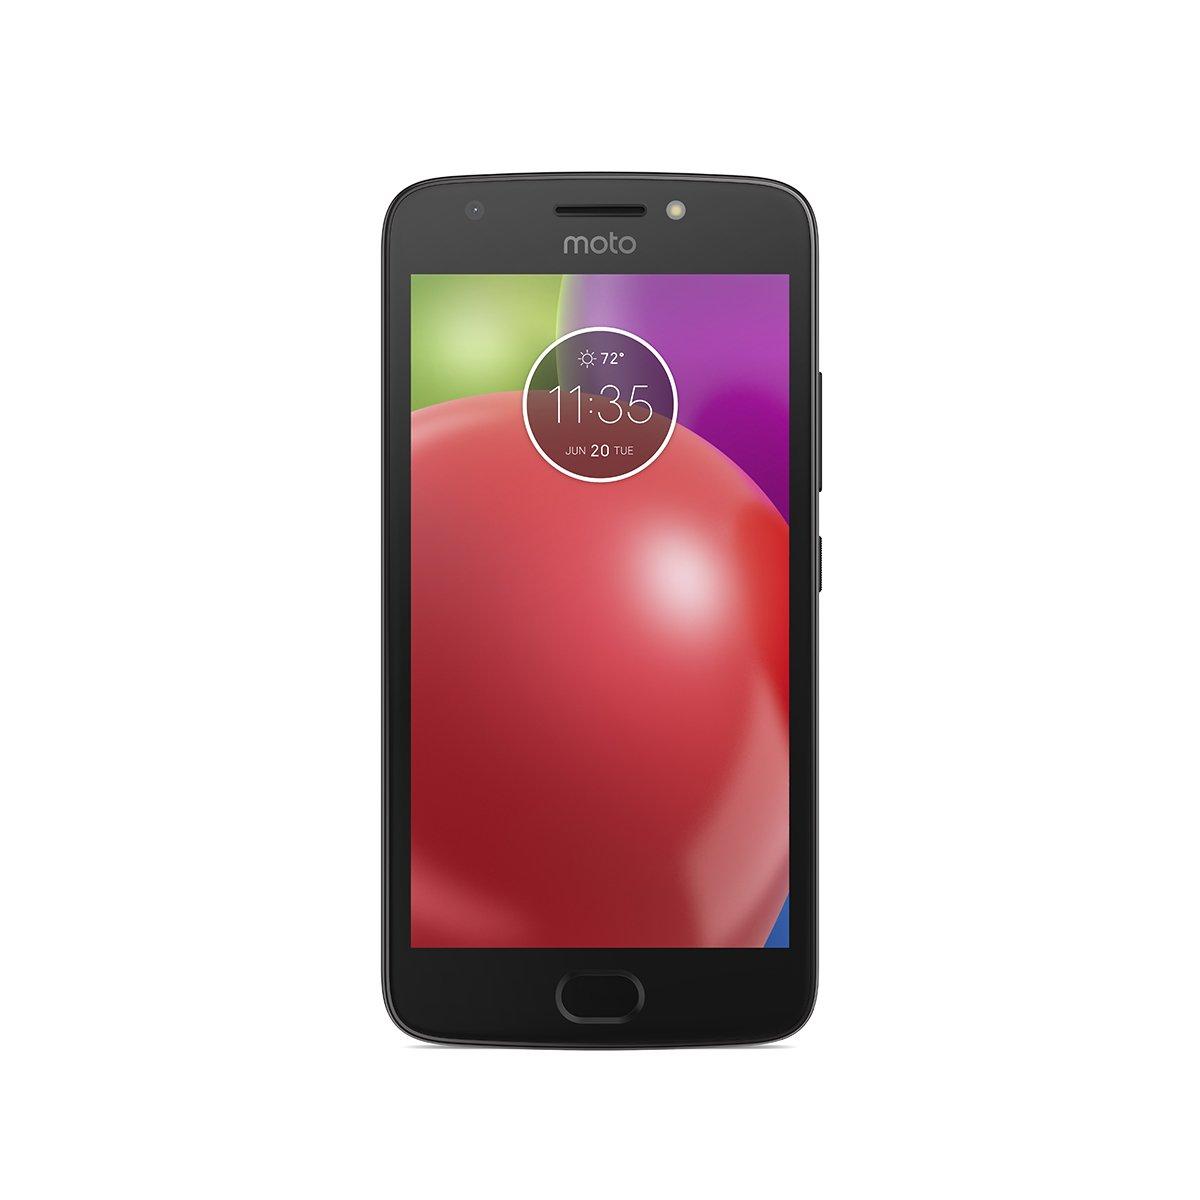 Moto E (4th Generation) - 16 GB - 3G Unlocked (AT&T/T-Mobile) + Verizon Wireless 4G LTE Smartphone - Black